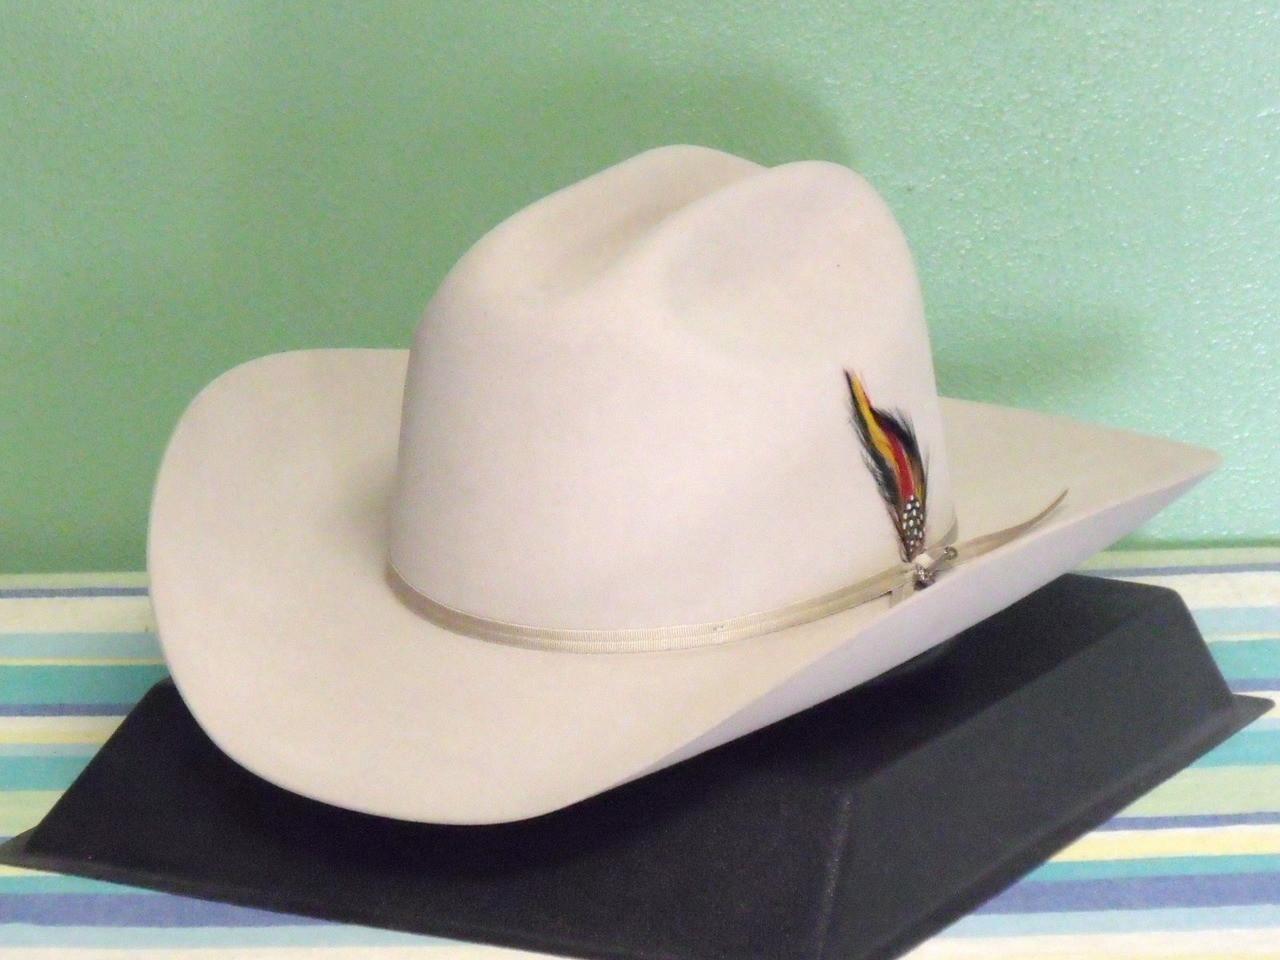 Stetson Roper 6X Fur Felt Cowboy Hat - One 2 mini Ranch 2c22ec5e0